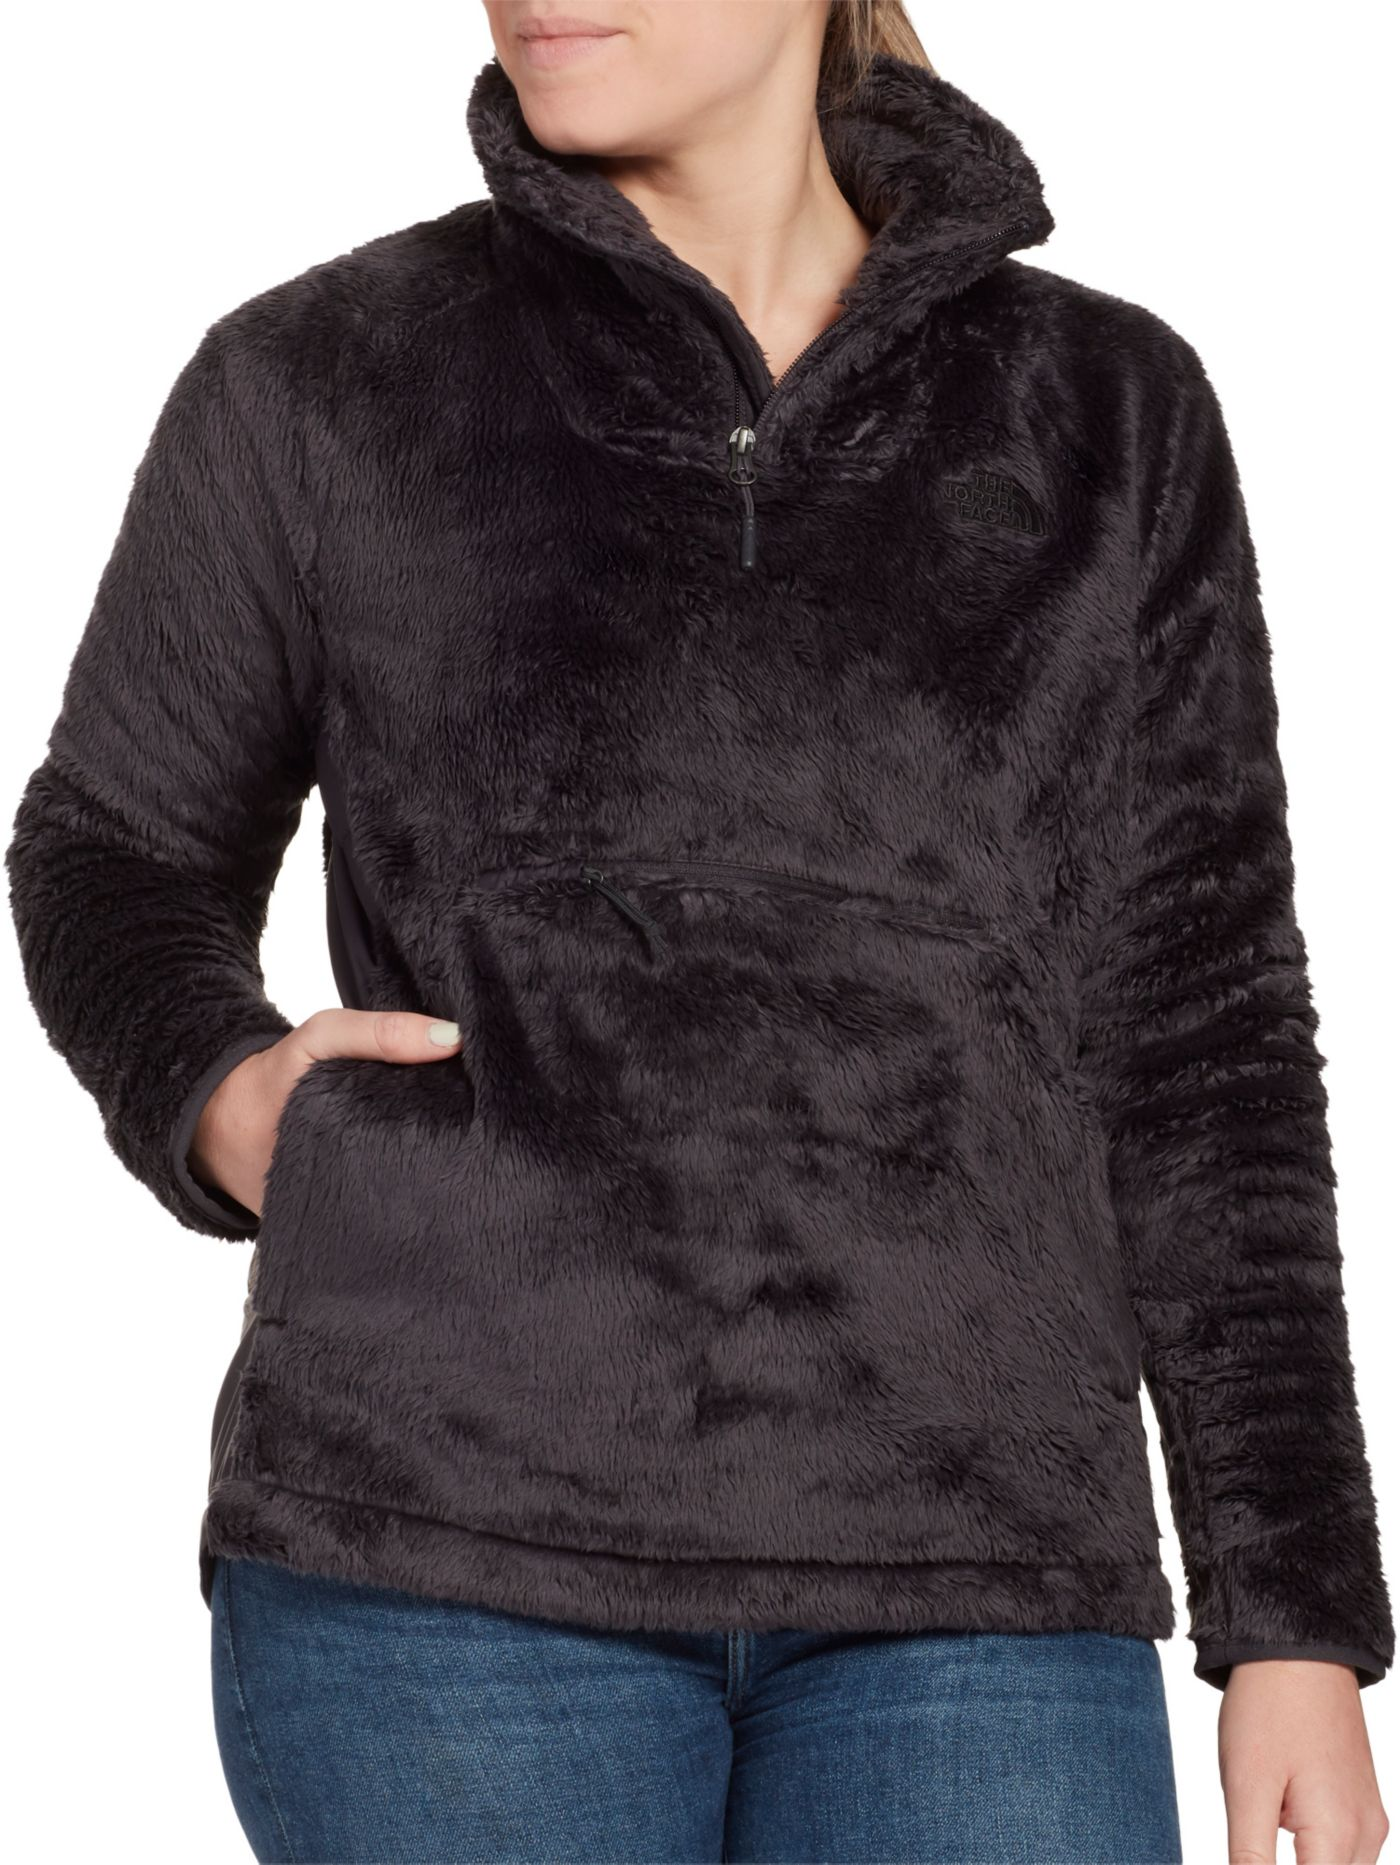 The North Face Women's Osito Sport Hybrid 1/4 Zip Fleece Pullover